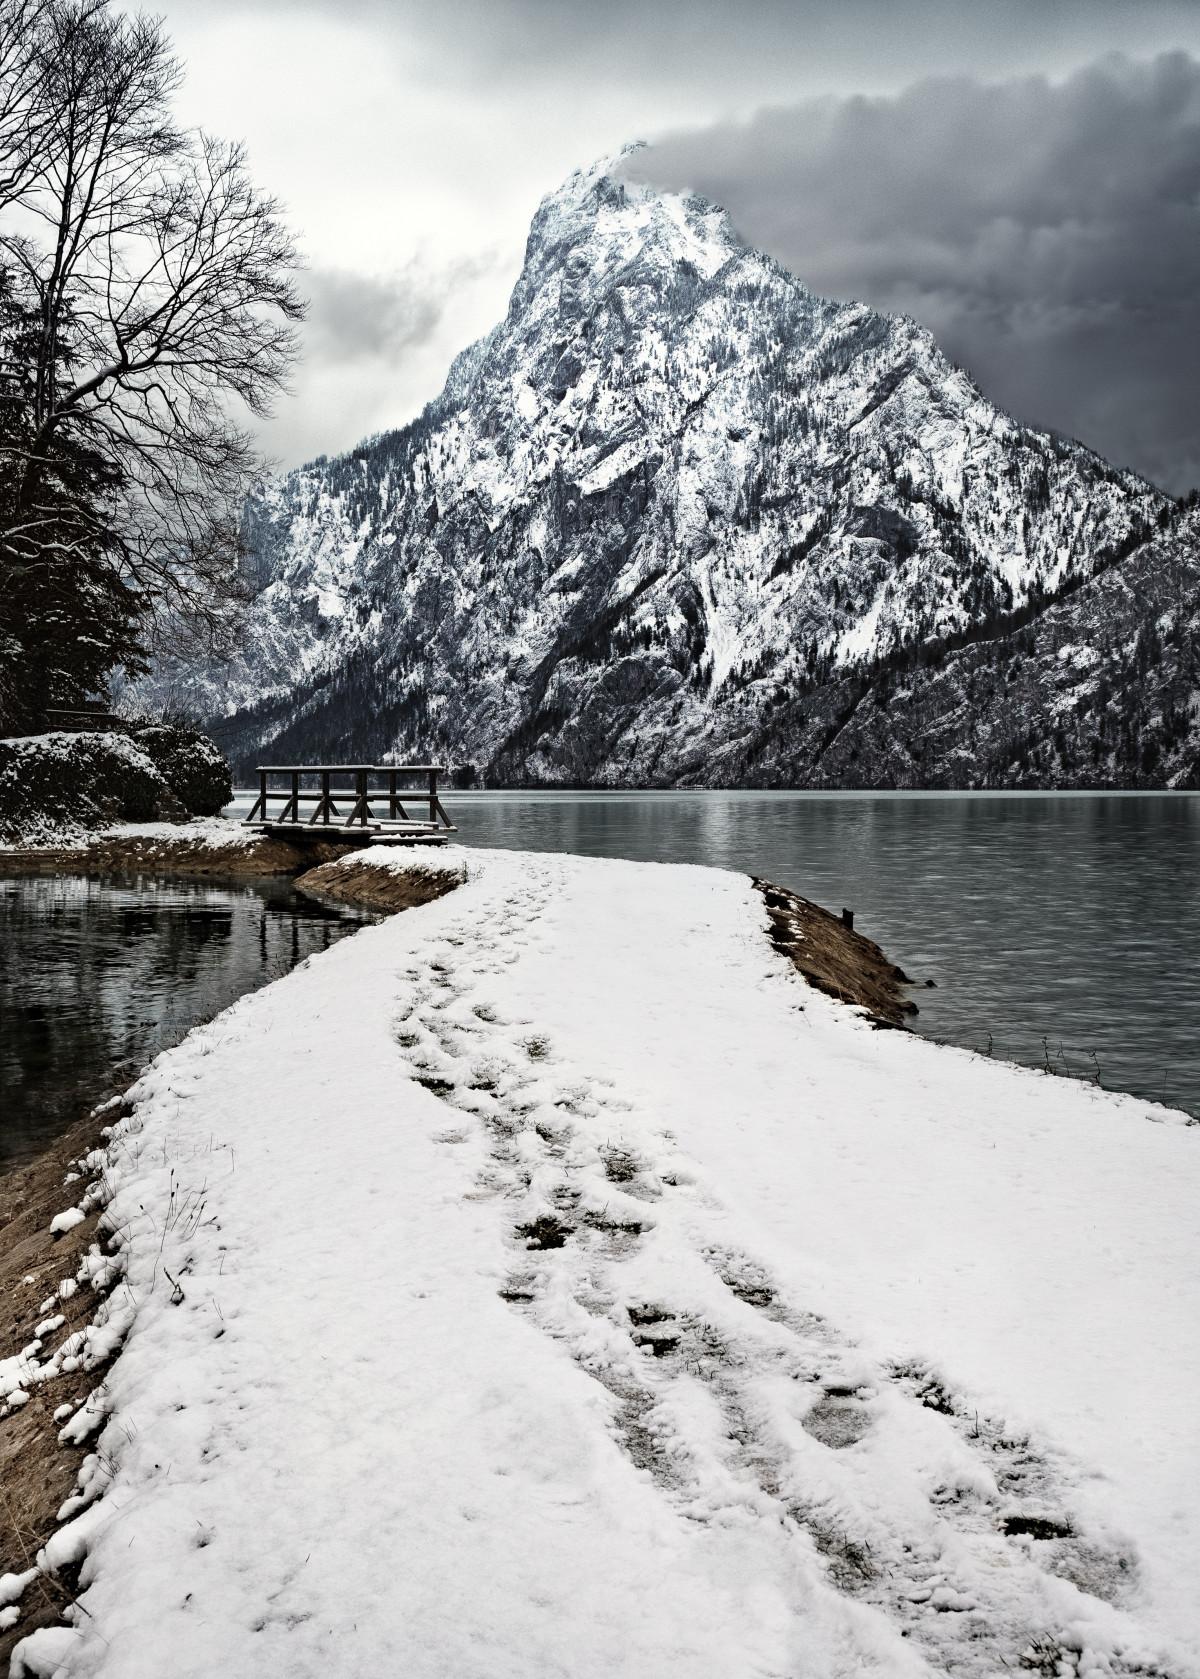 Gambar : pemandangan, gunung, salju, musim dingin, danau ...